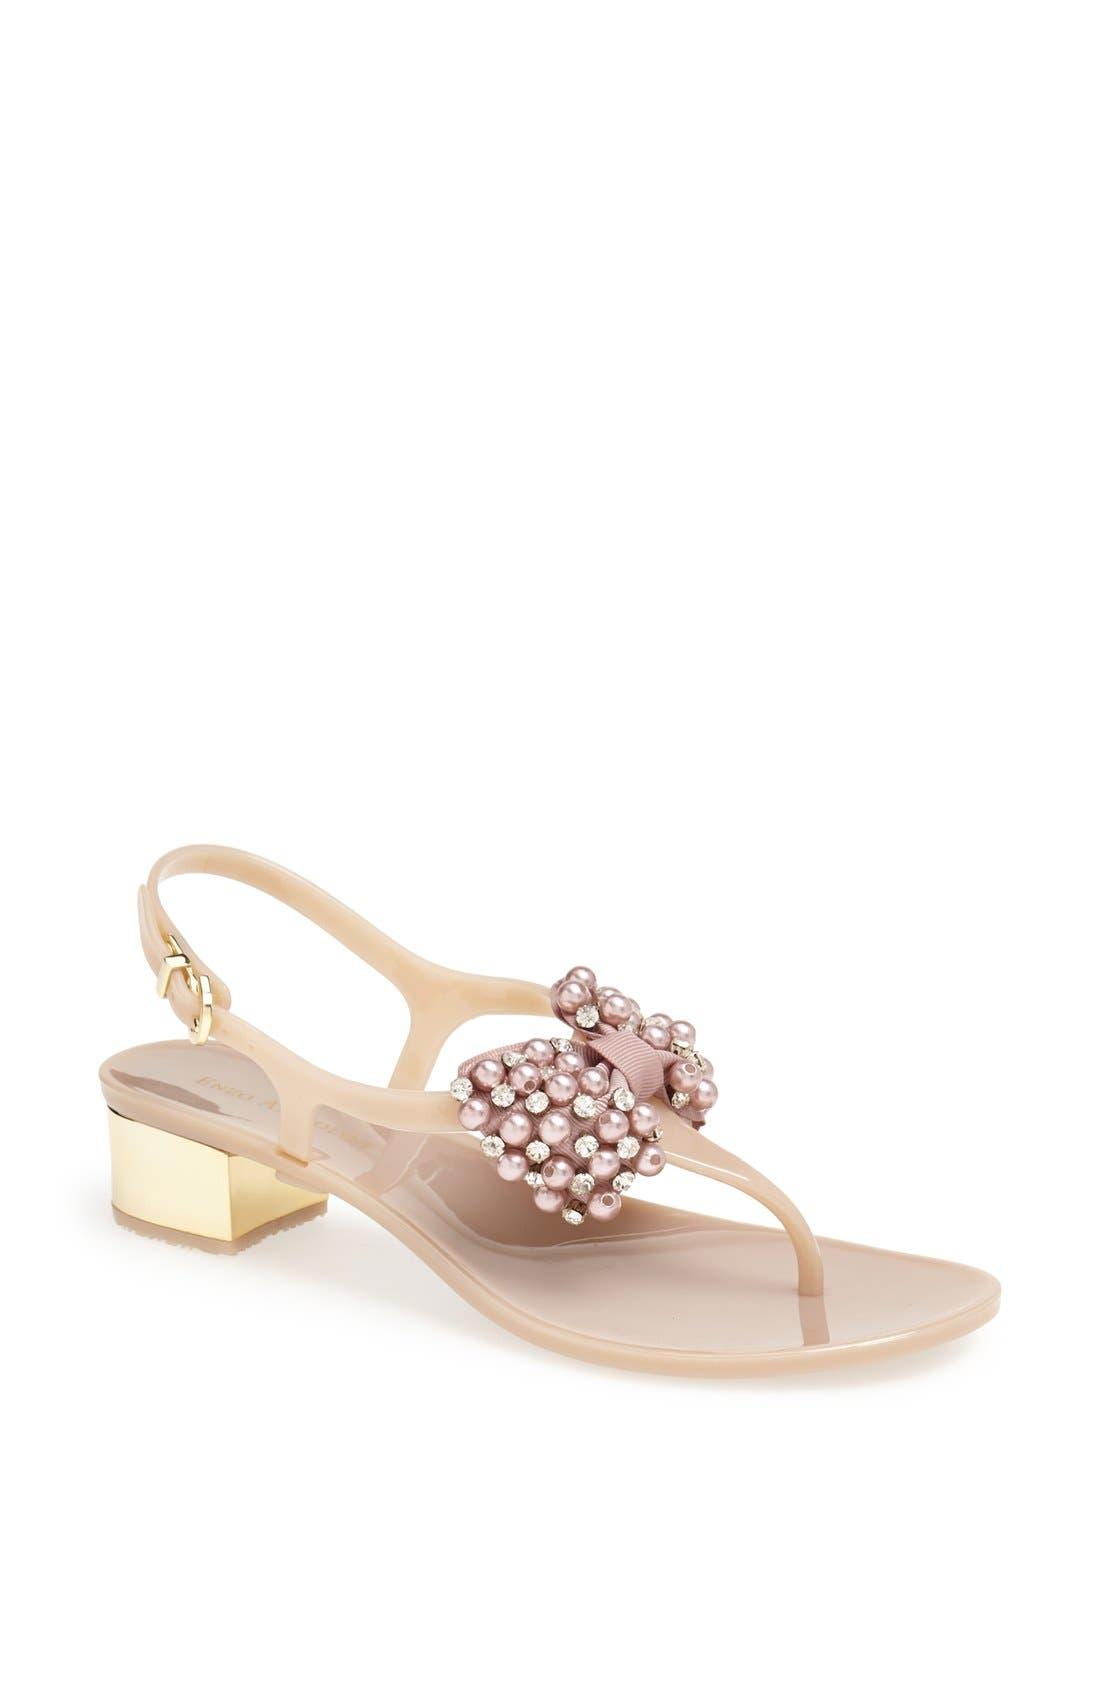 Alternate Image 1 Selected - Enzo Angiolini 'Aiza' Thong Sandal